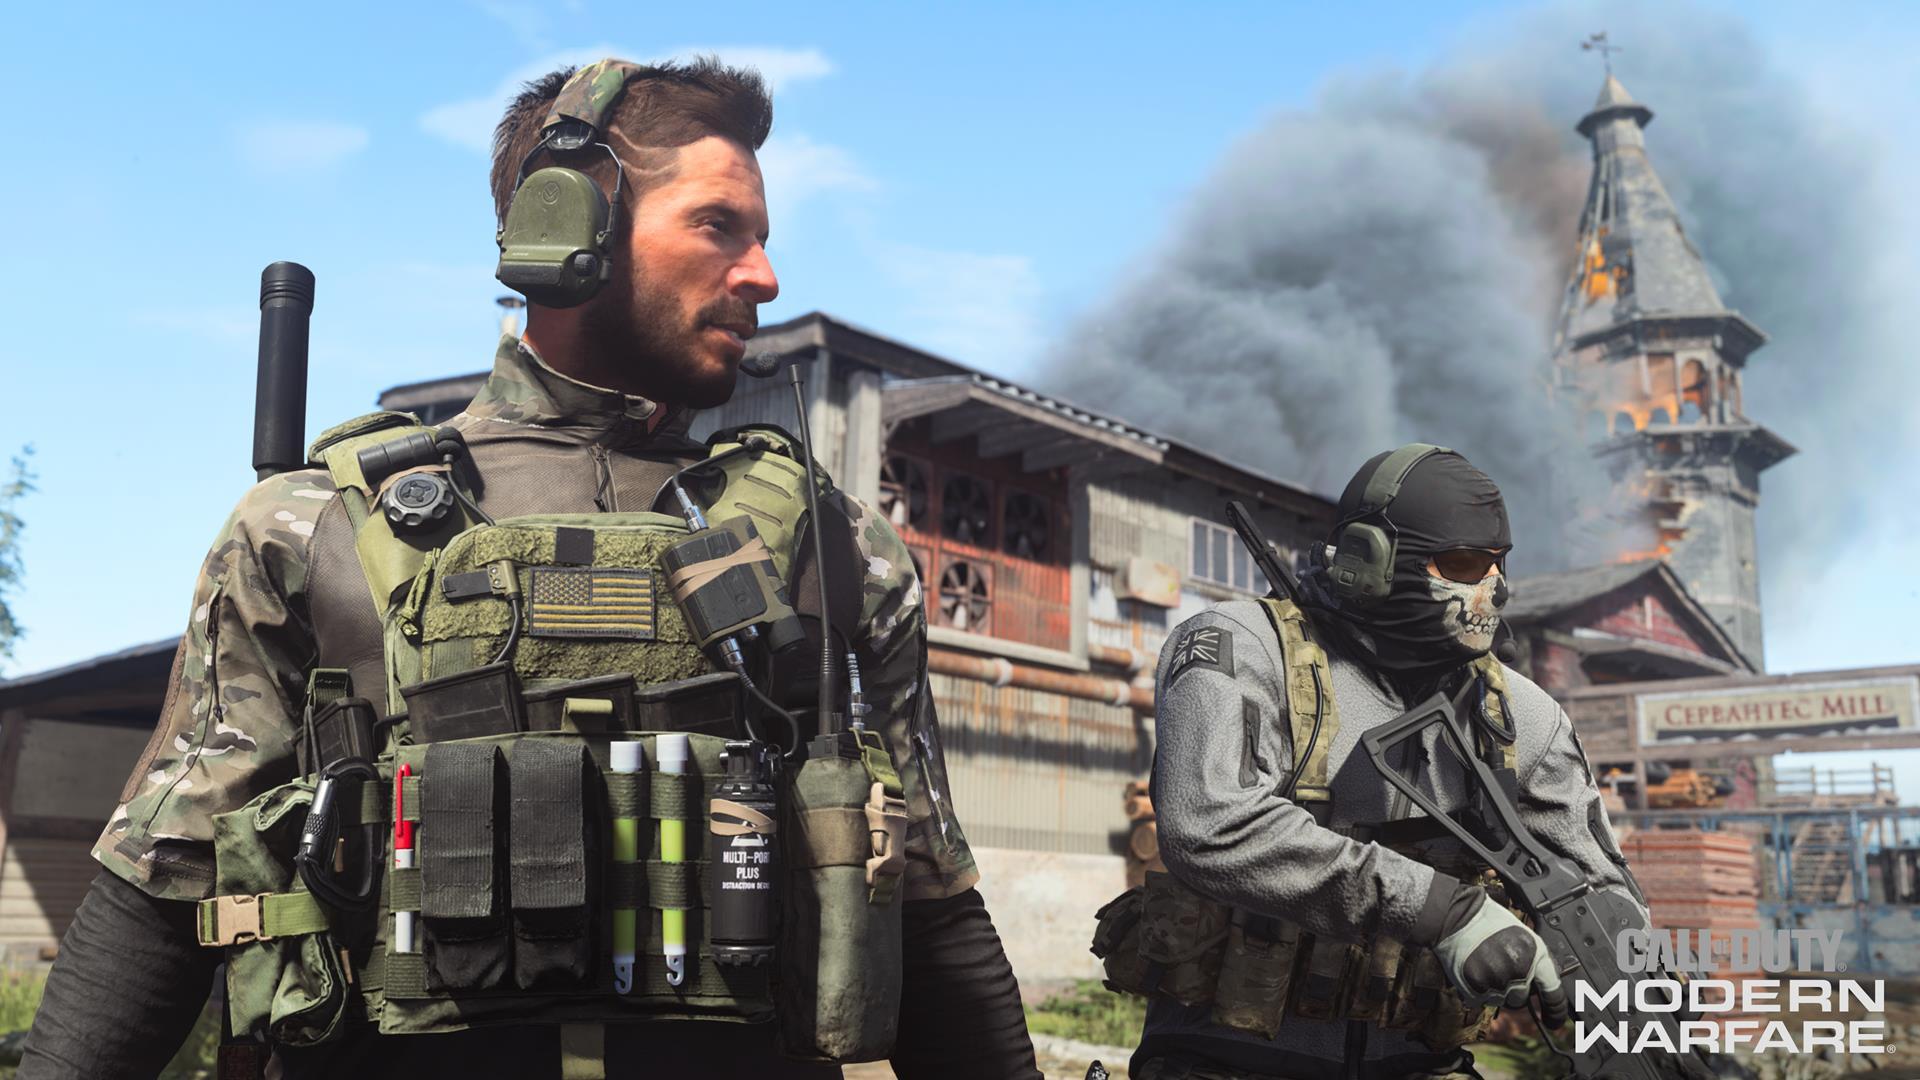 Modern Warfare Cheapens Its Campaign By Resurrecting A Dead Hero